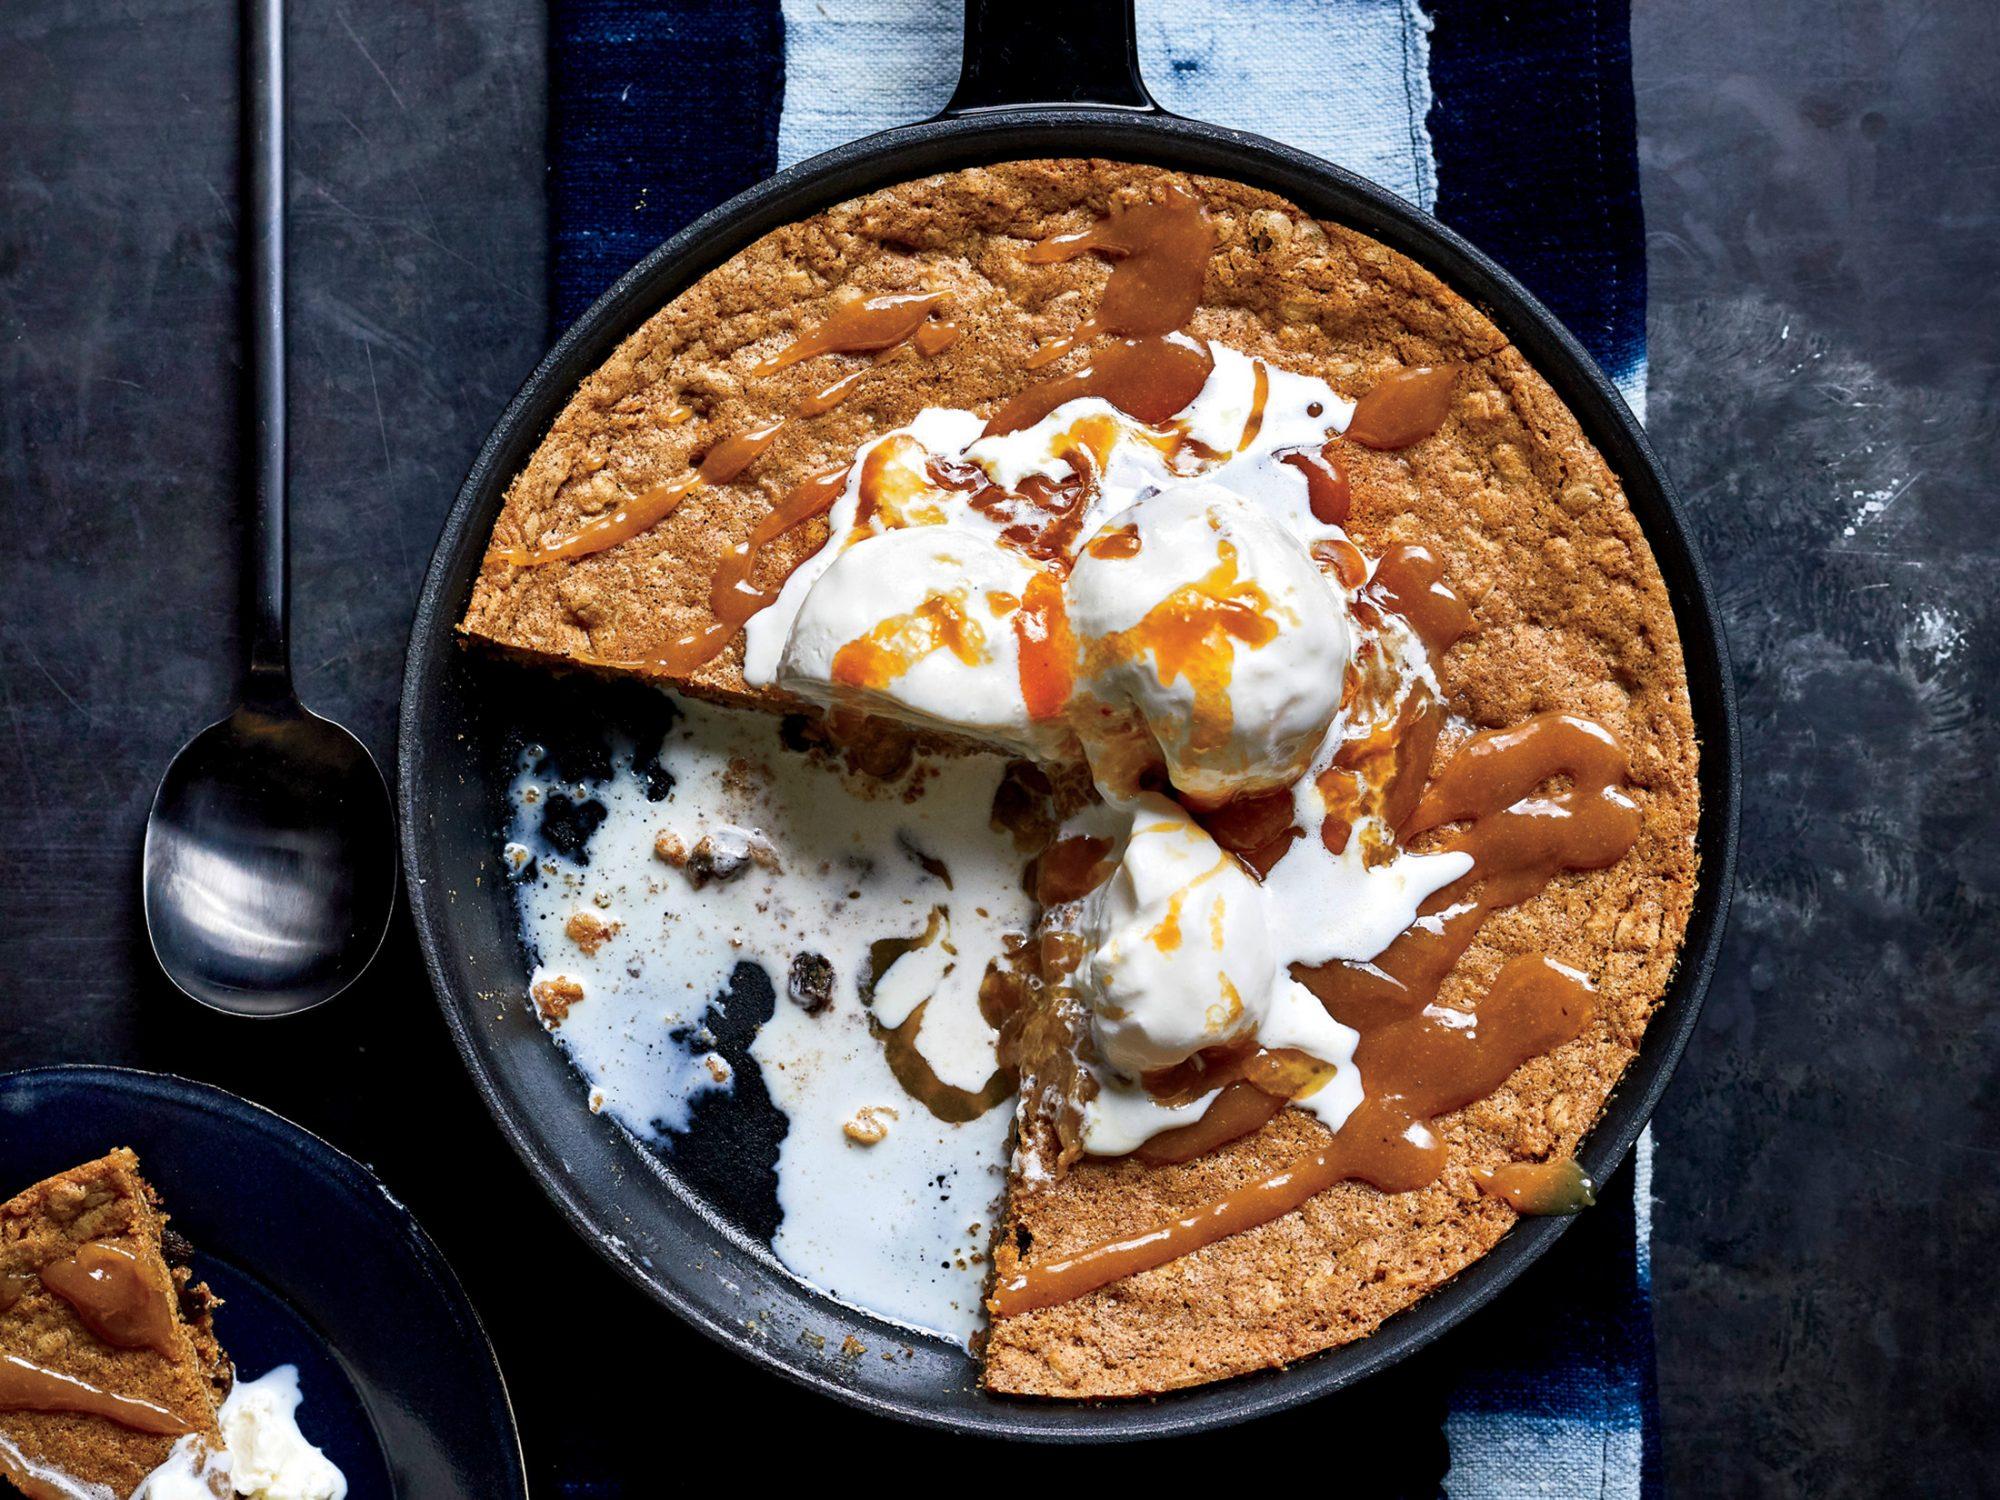 Oatmeal-Raisin Skillet Cookie with Miso-Caramel Sauce